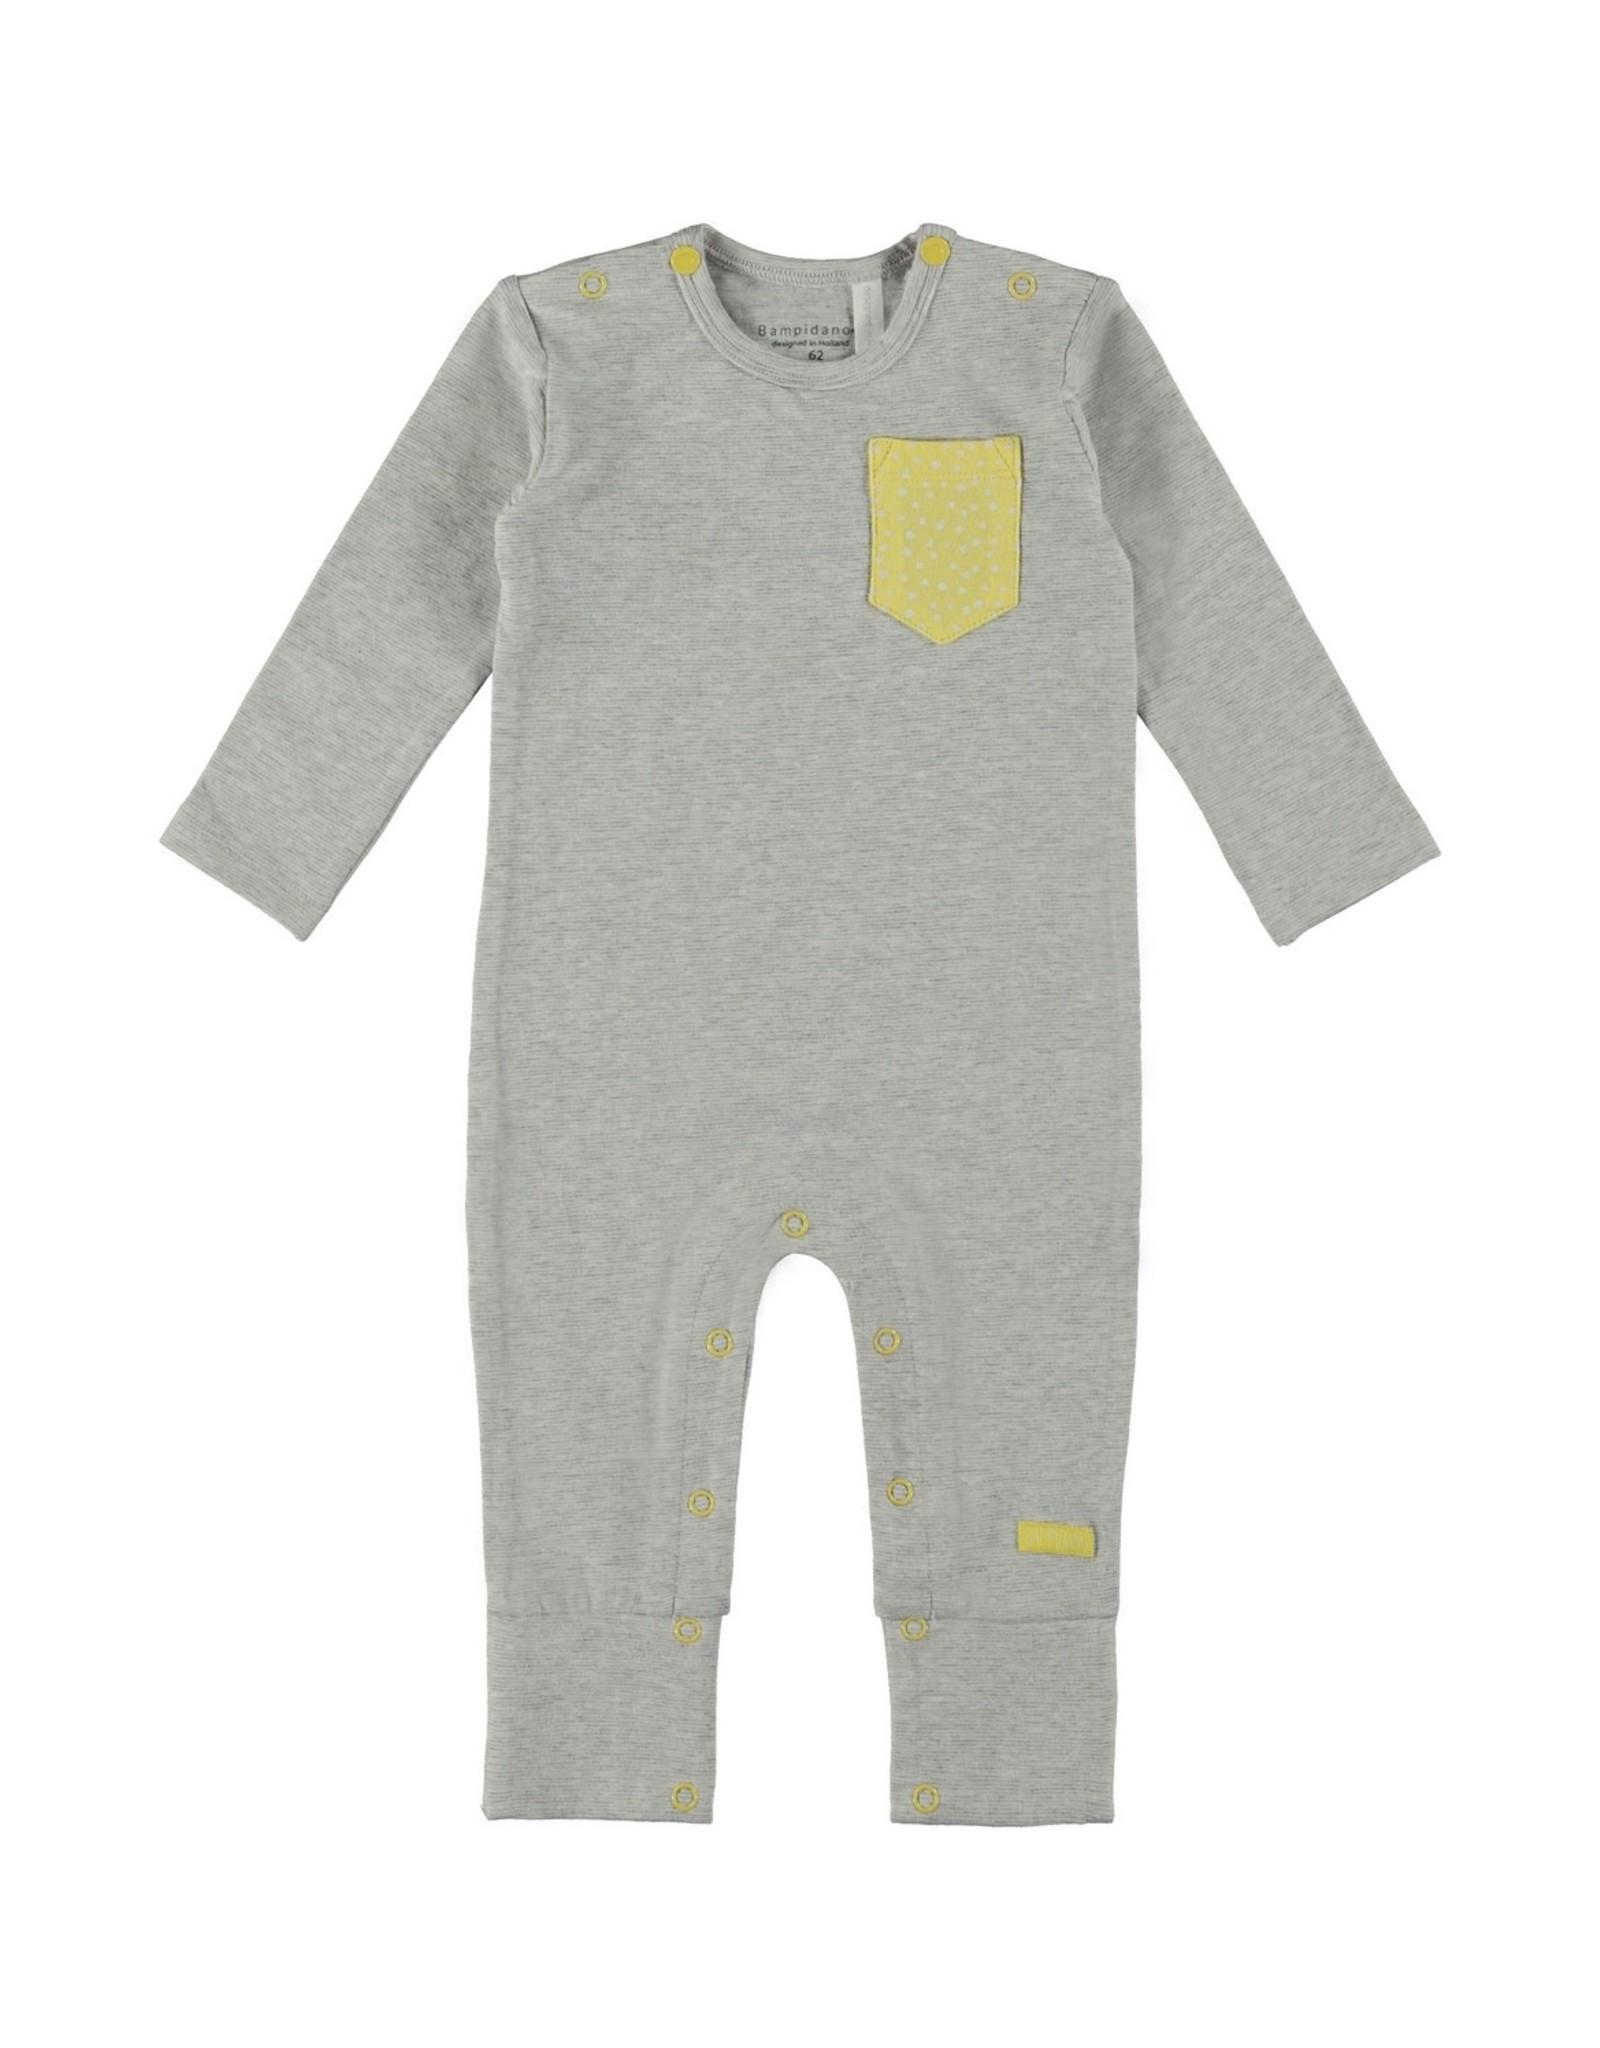 Little Bampidano Bampidano New Born Overall Melange Y/D + chest pocket GREY MELEE STRIPE